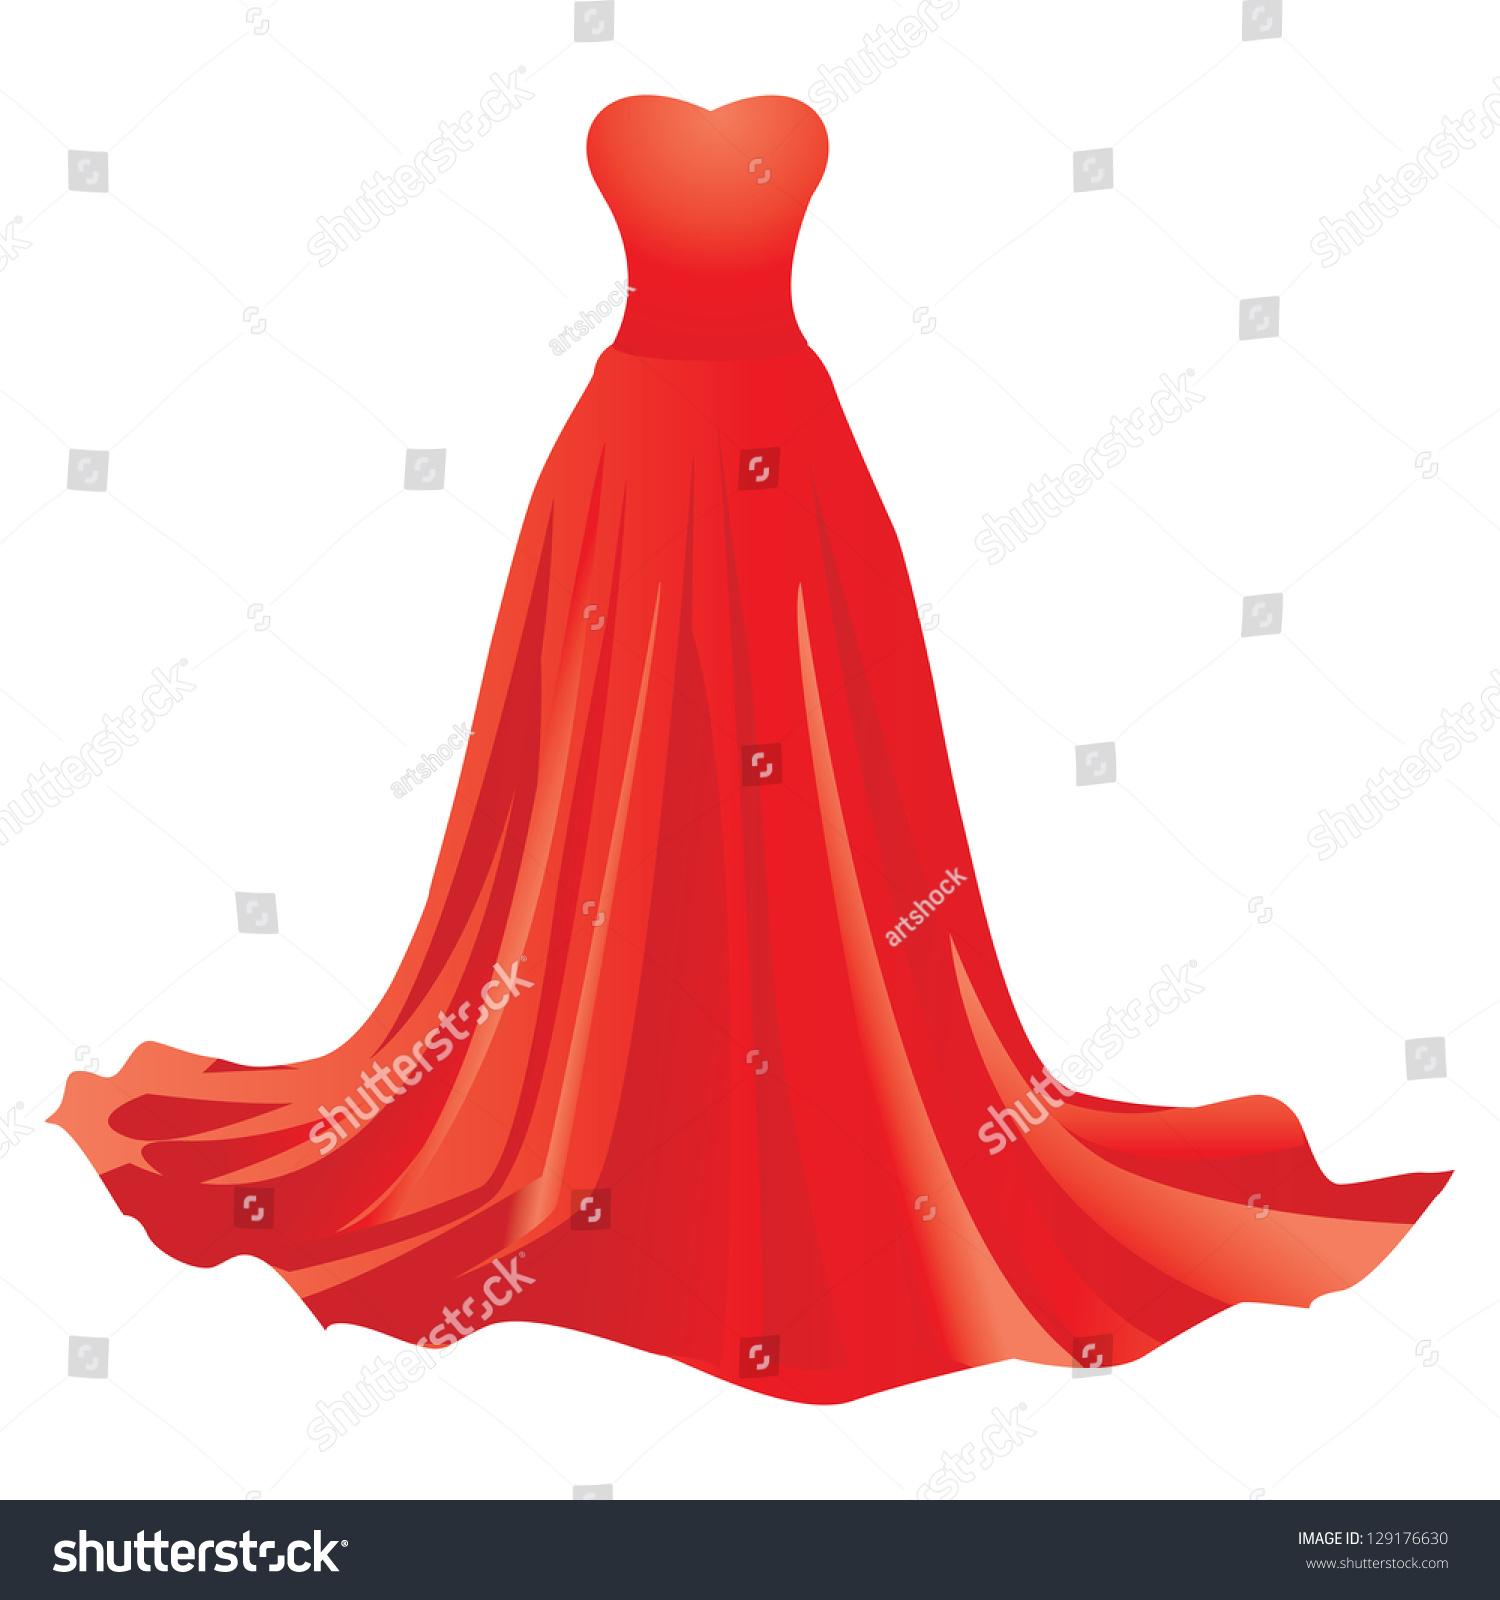 Cinderella Dresses Stock Vector Illustration Of Isolated: Illustration Red Dress Isolated On White Stock Vector